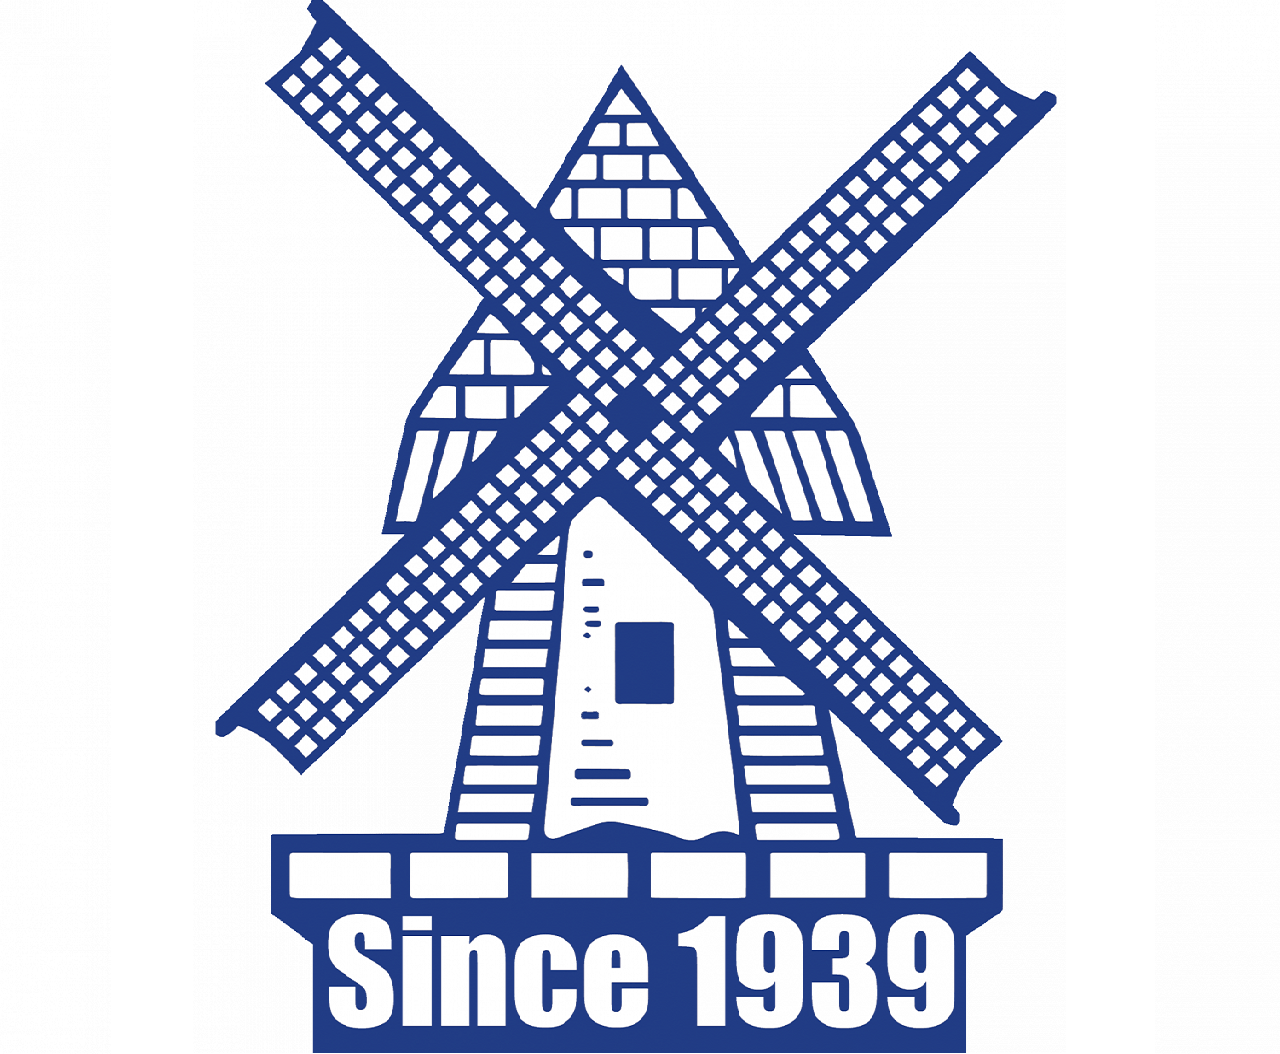 cummins isx price 50 00 [ 1280 x 956 Pixel ]